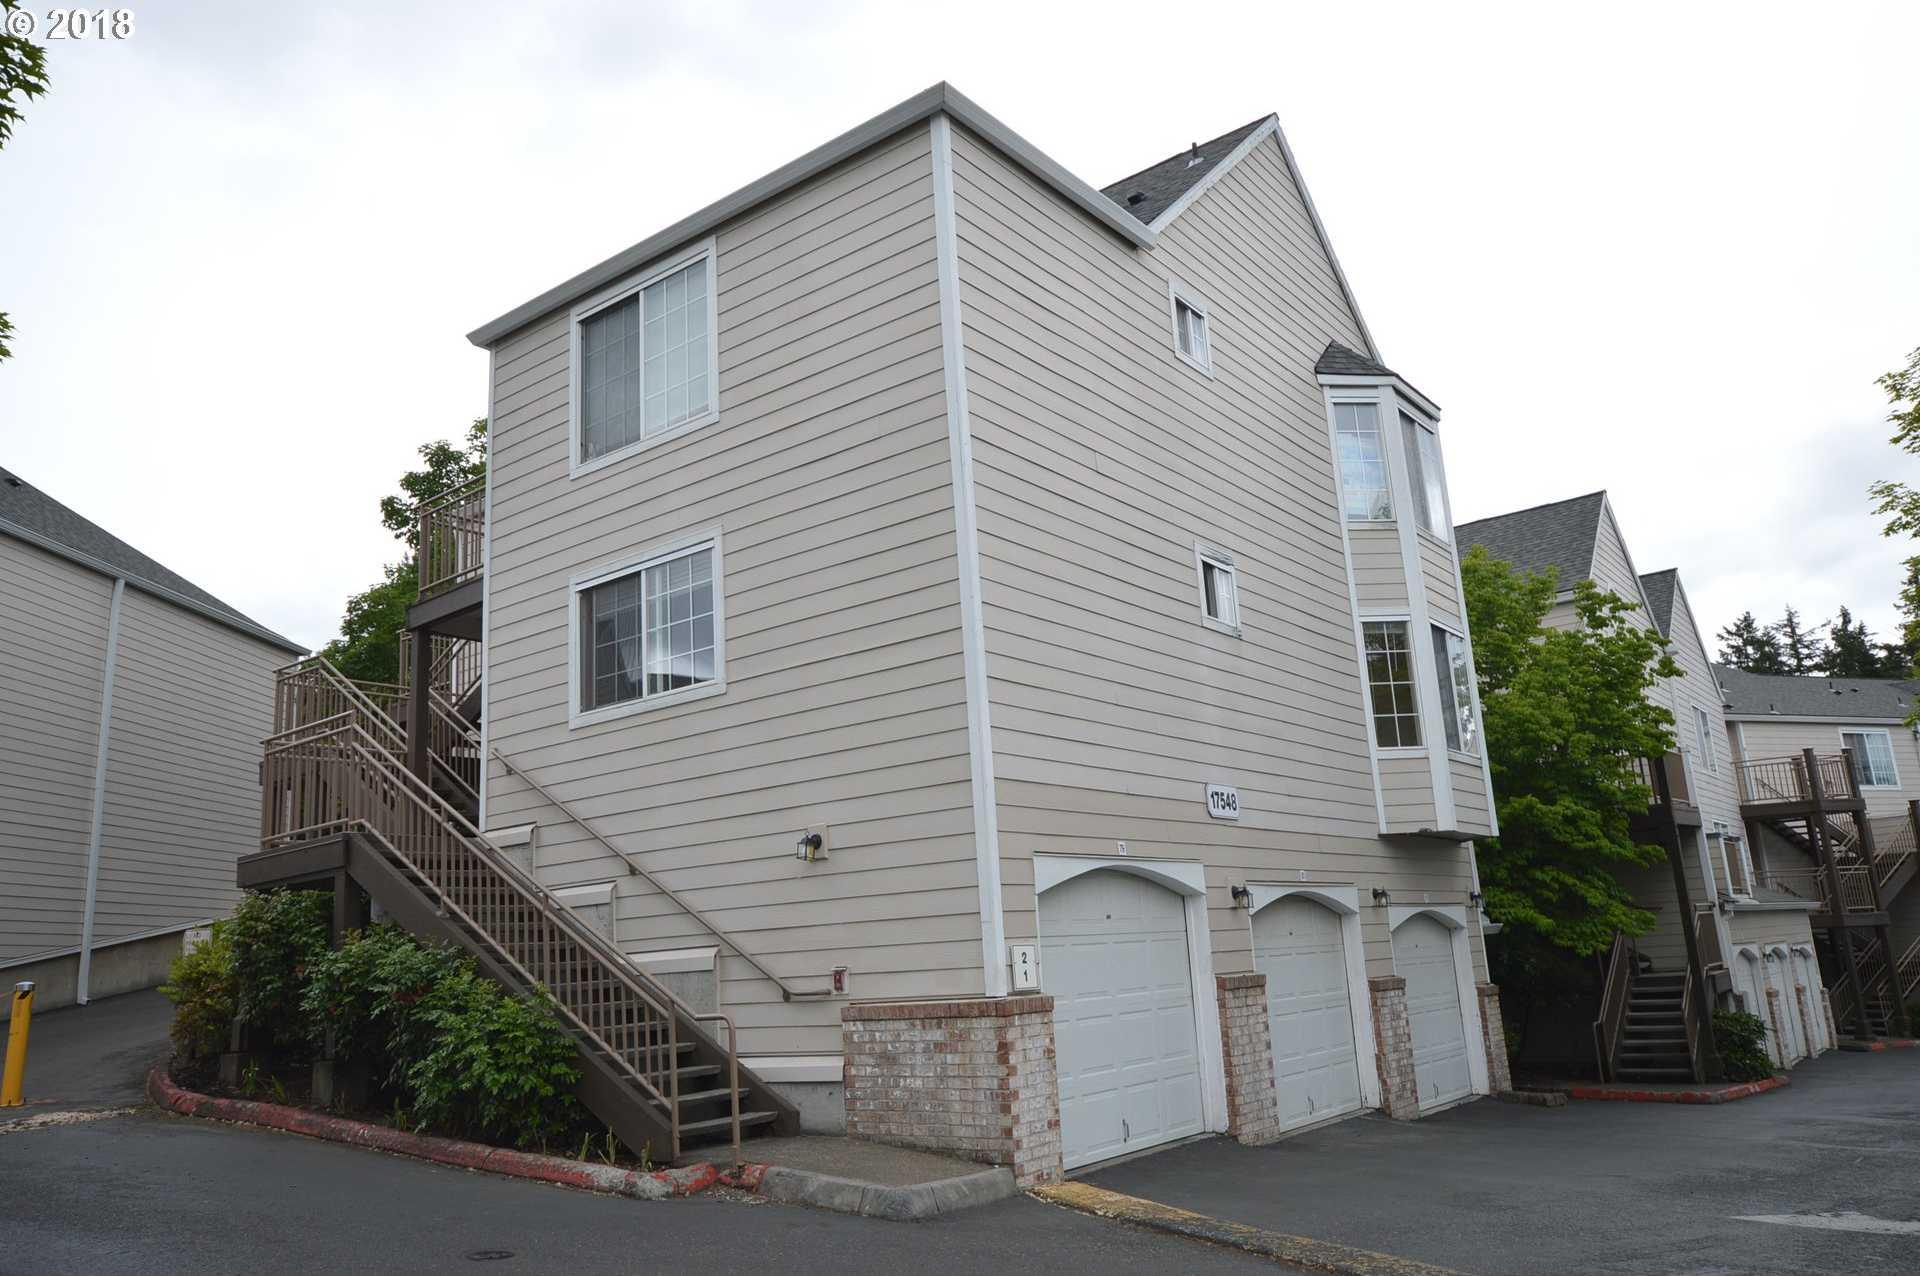 $209,900 - 2Br/2Ba -  for Sale in Courtyards At Springville, Portland